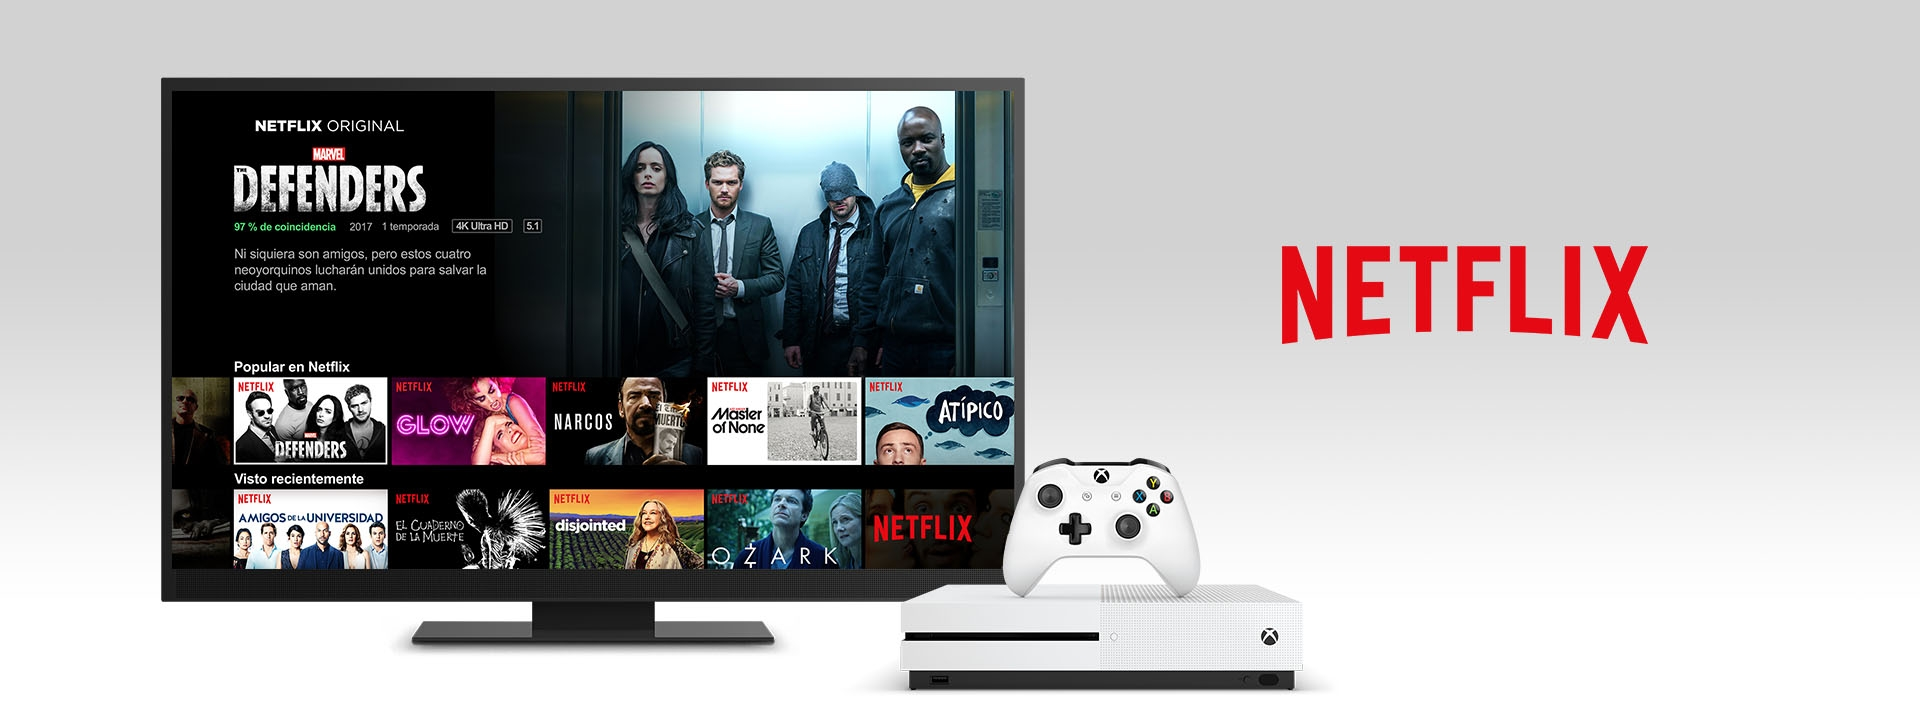 Netflix en una consola Xbox One